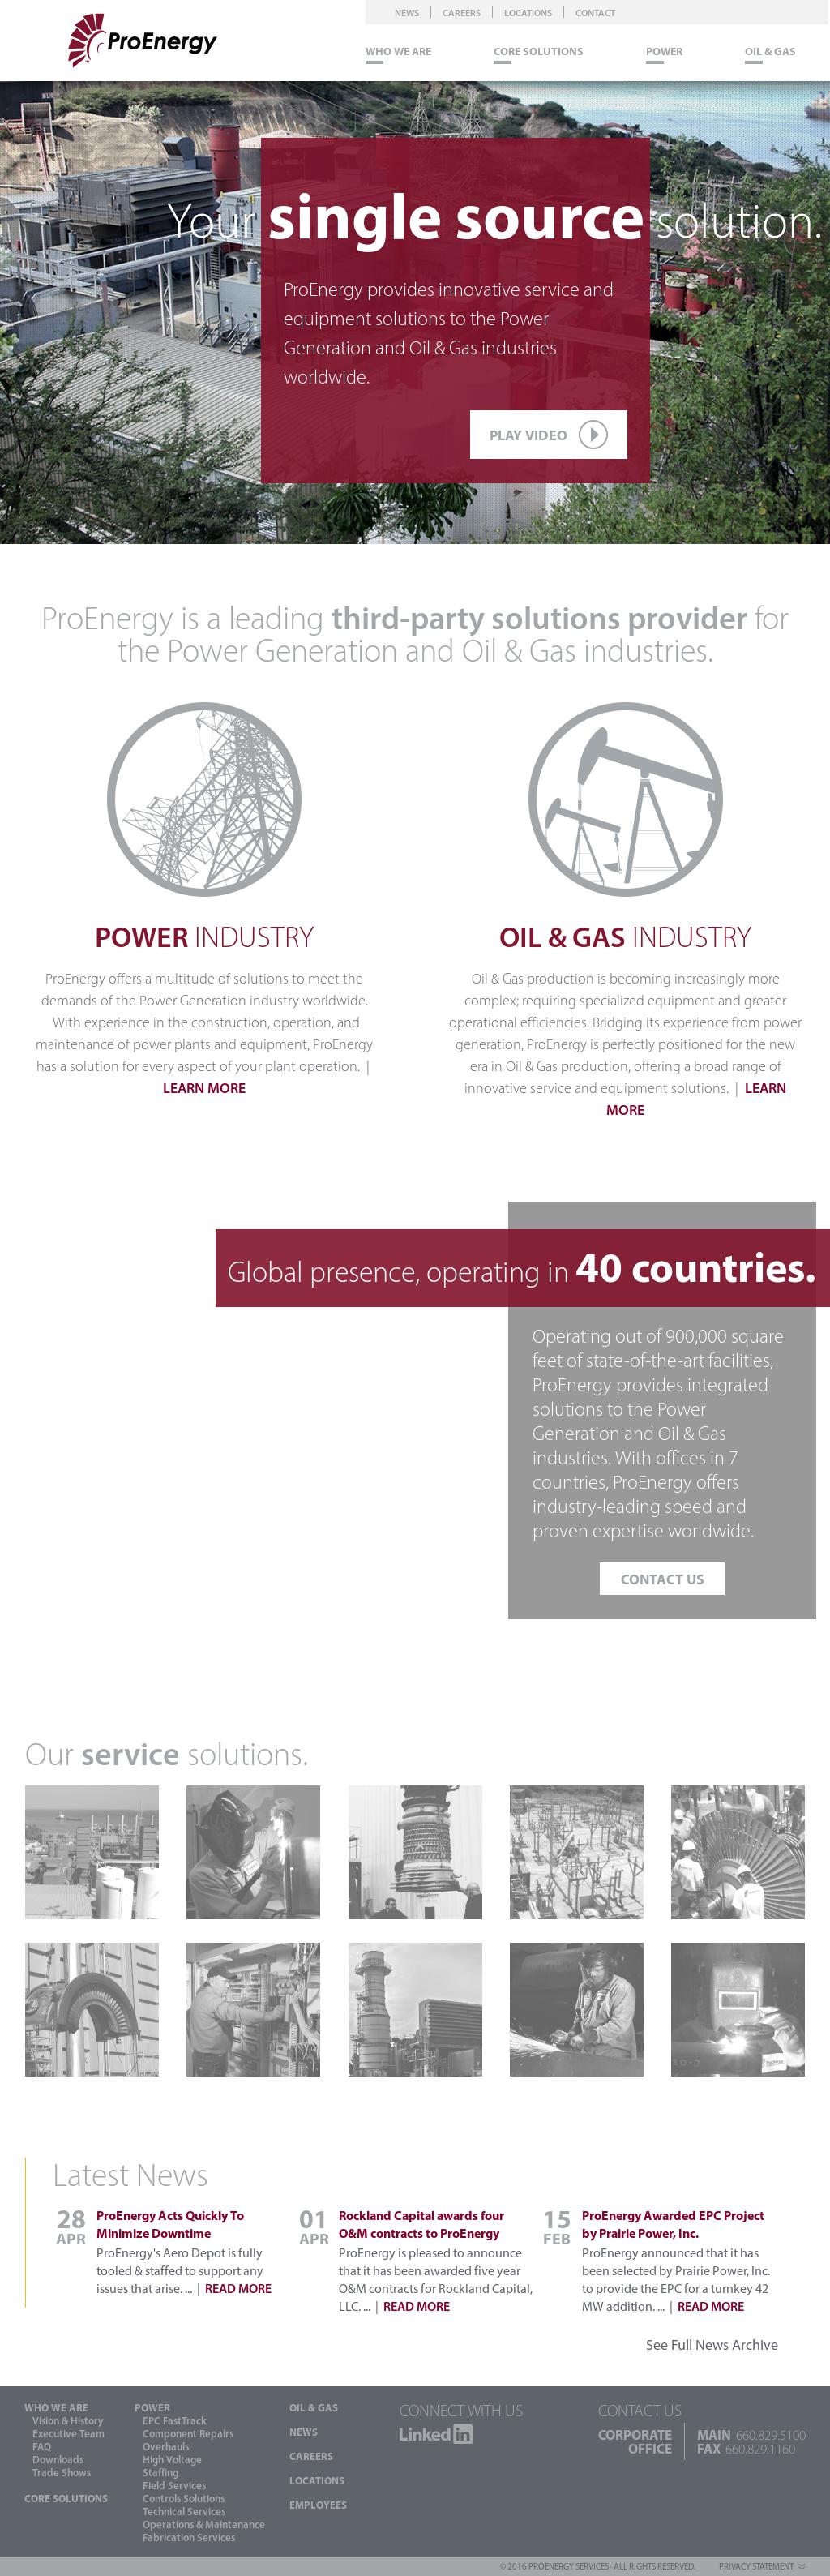 Pro Energy Services Sedalia Mo - Energy Etfs